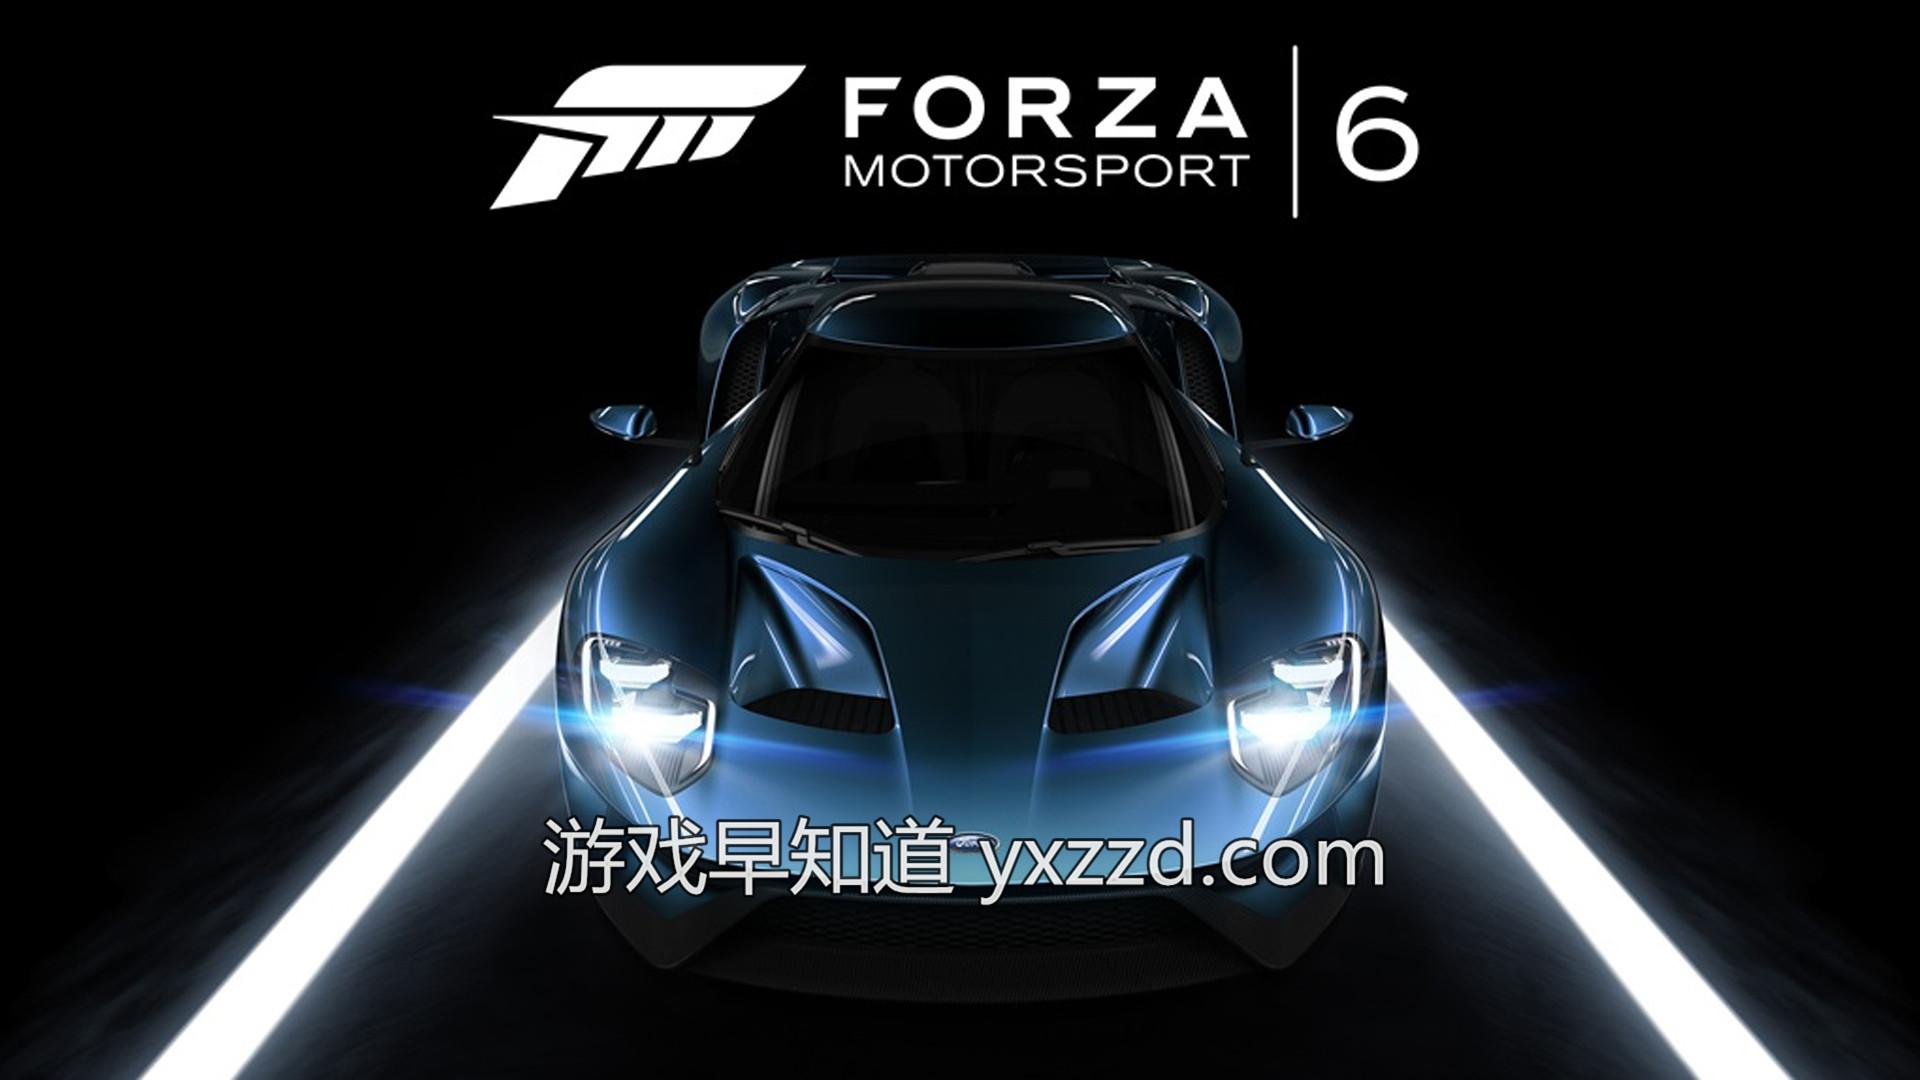 Xboxone独占极限竞速6Forza6预购预下载